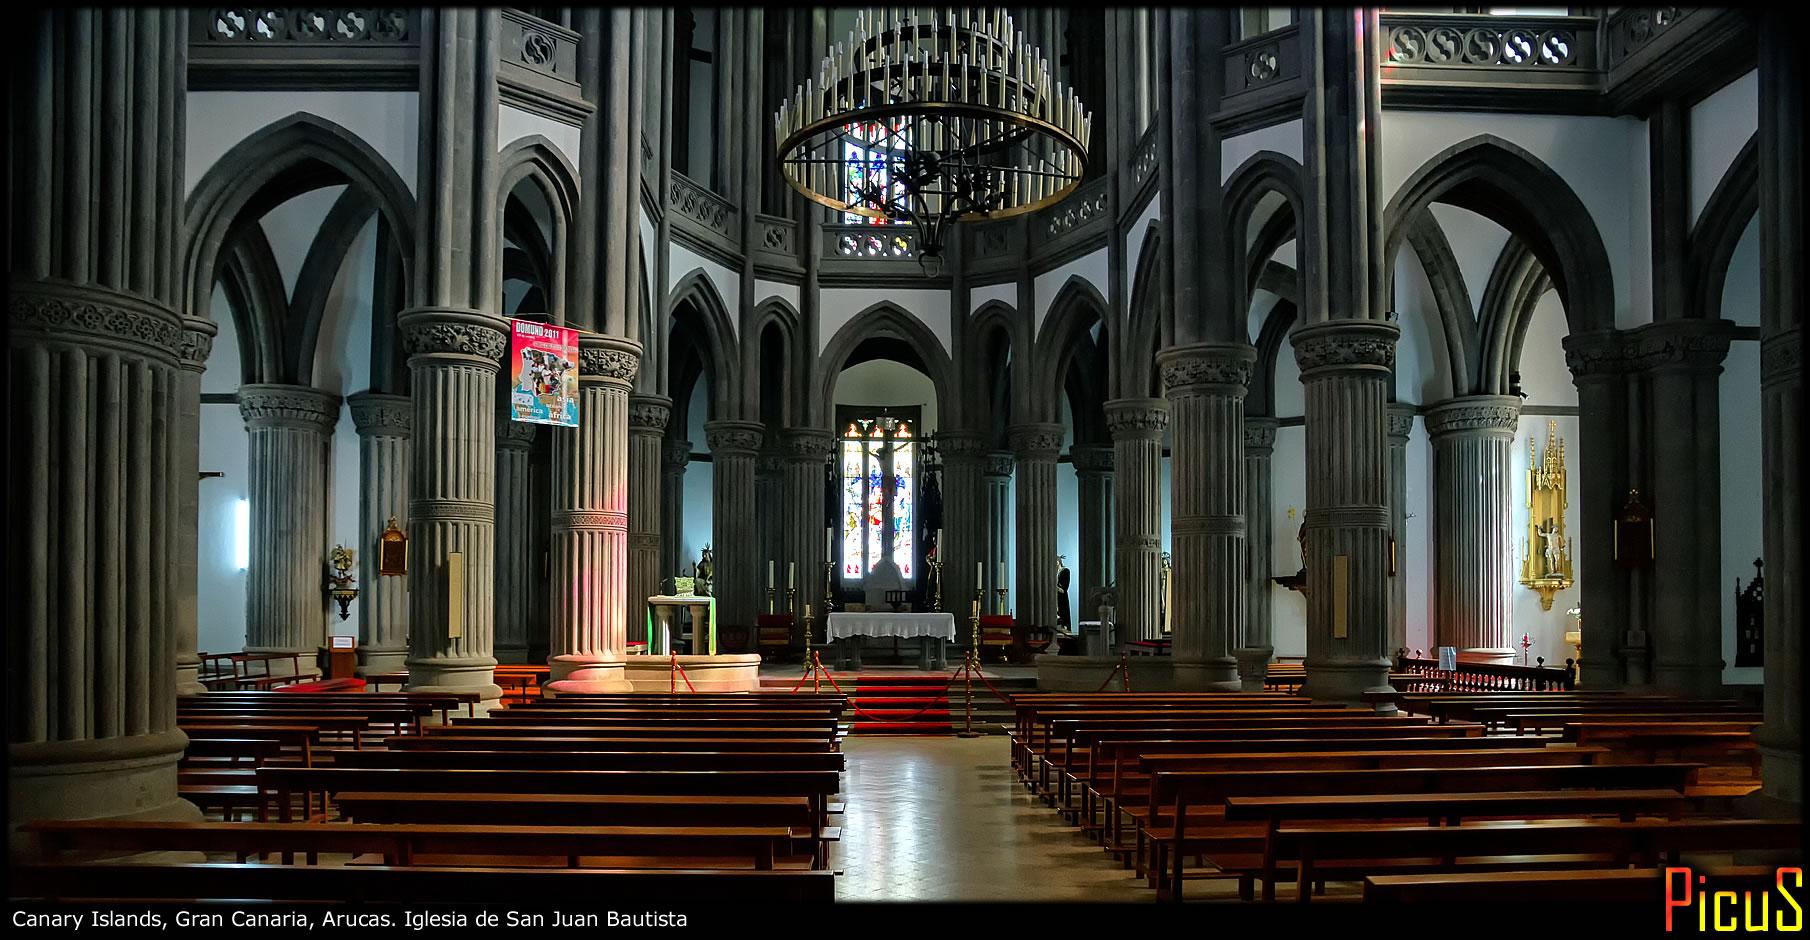 Iglesia de San Juan Bautista и не только